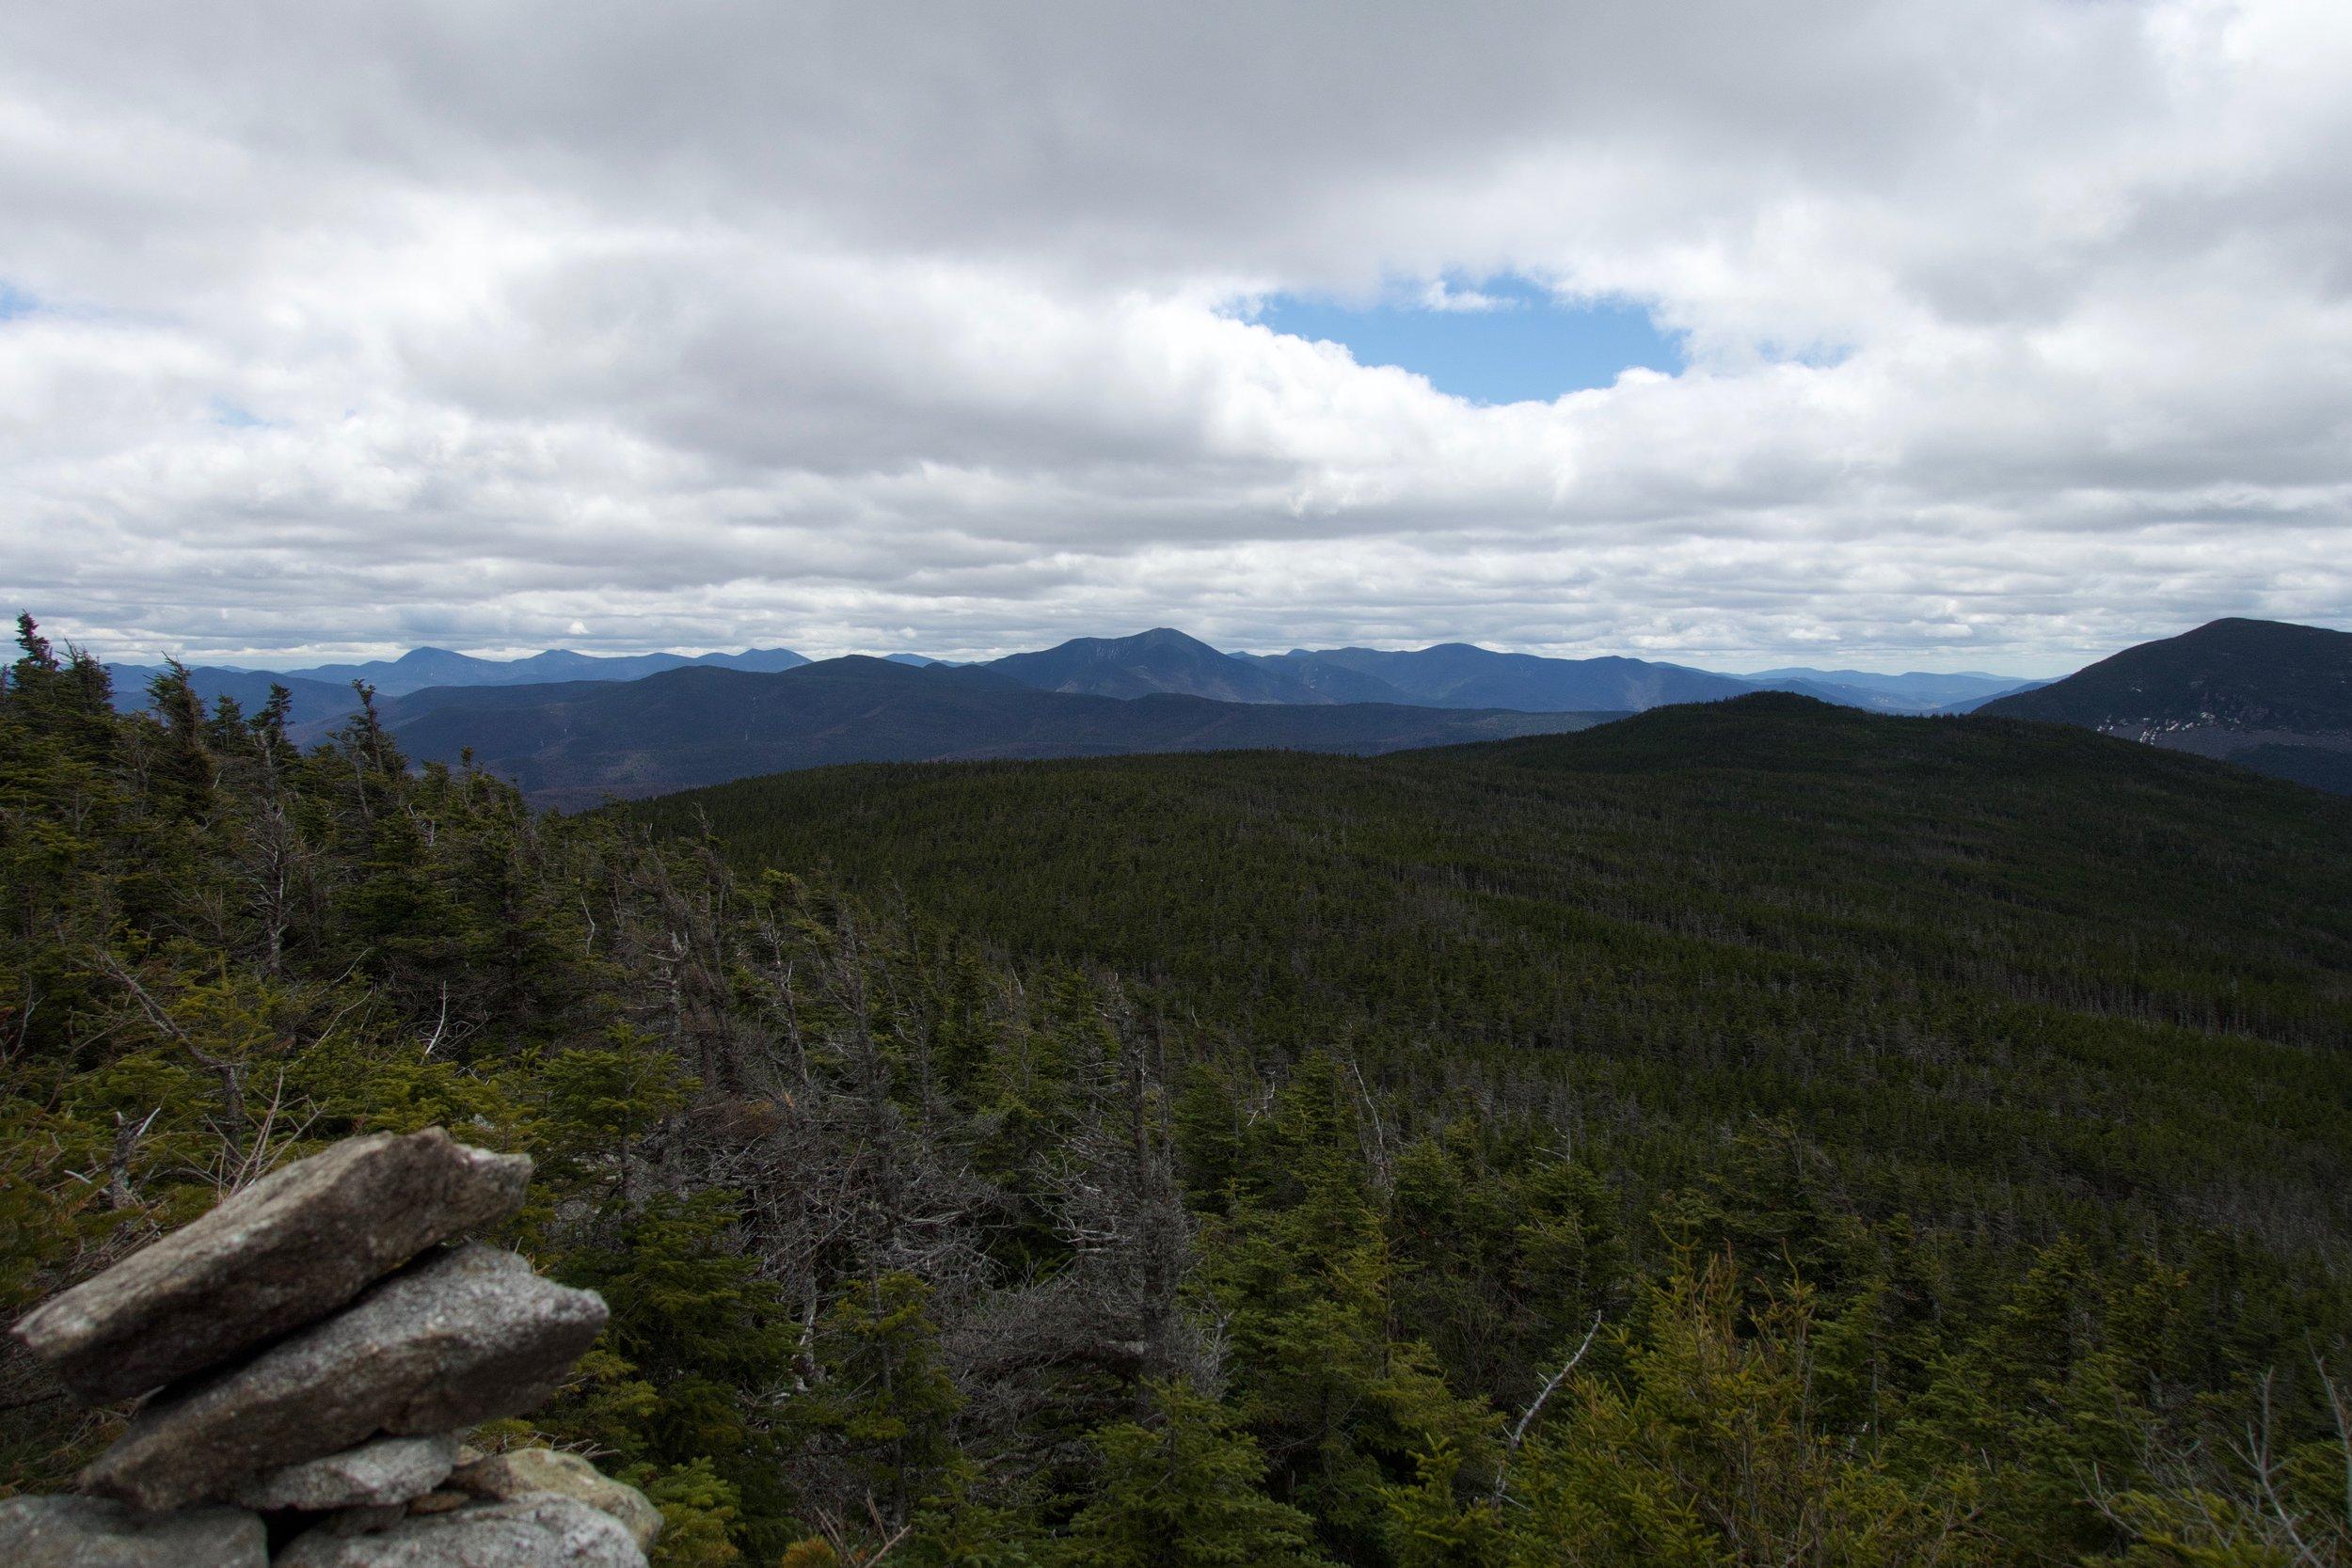 Top of Mount Jackson